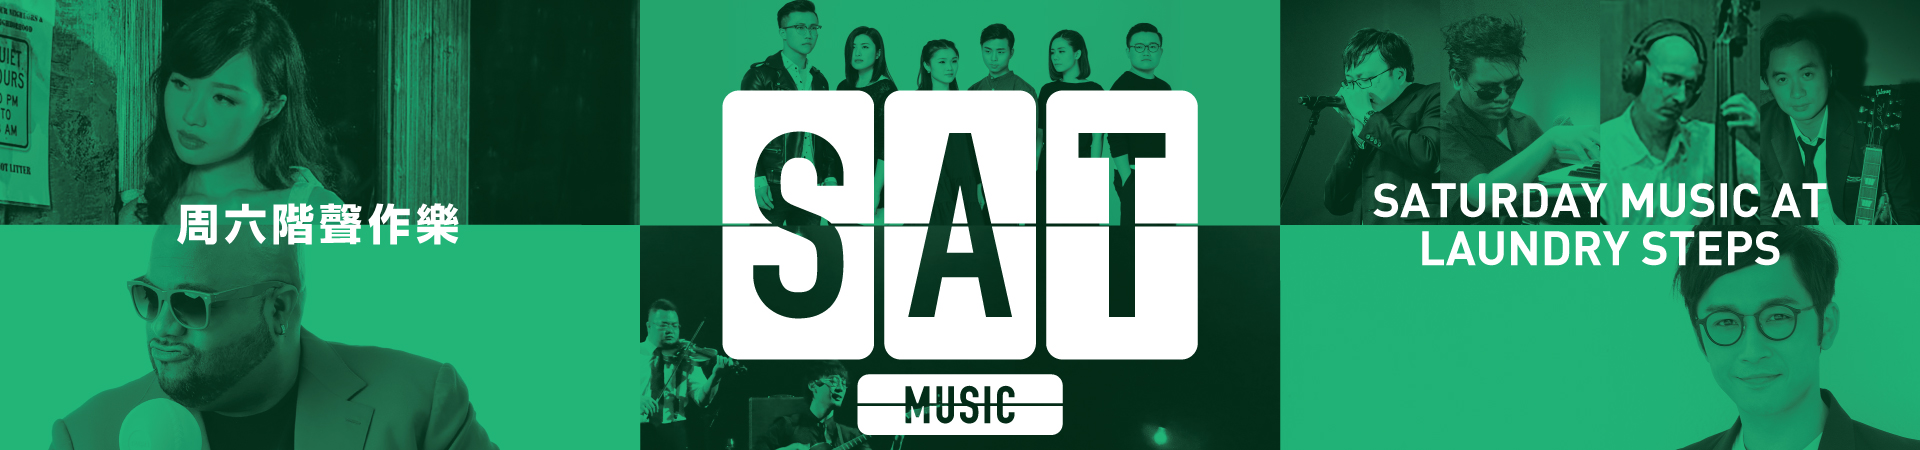 Saturday Music at Laundry Steps | Tai Kwun